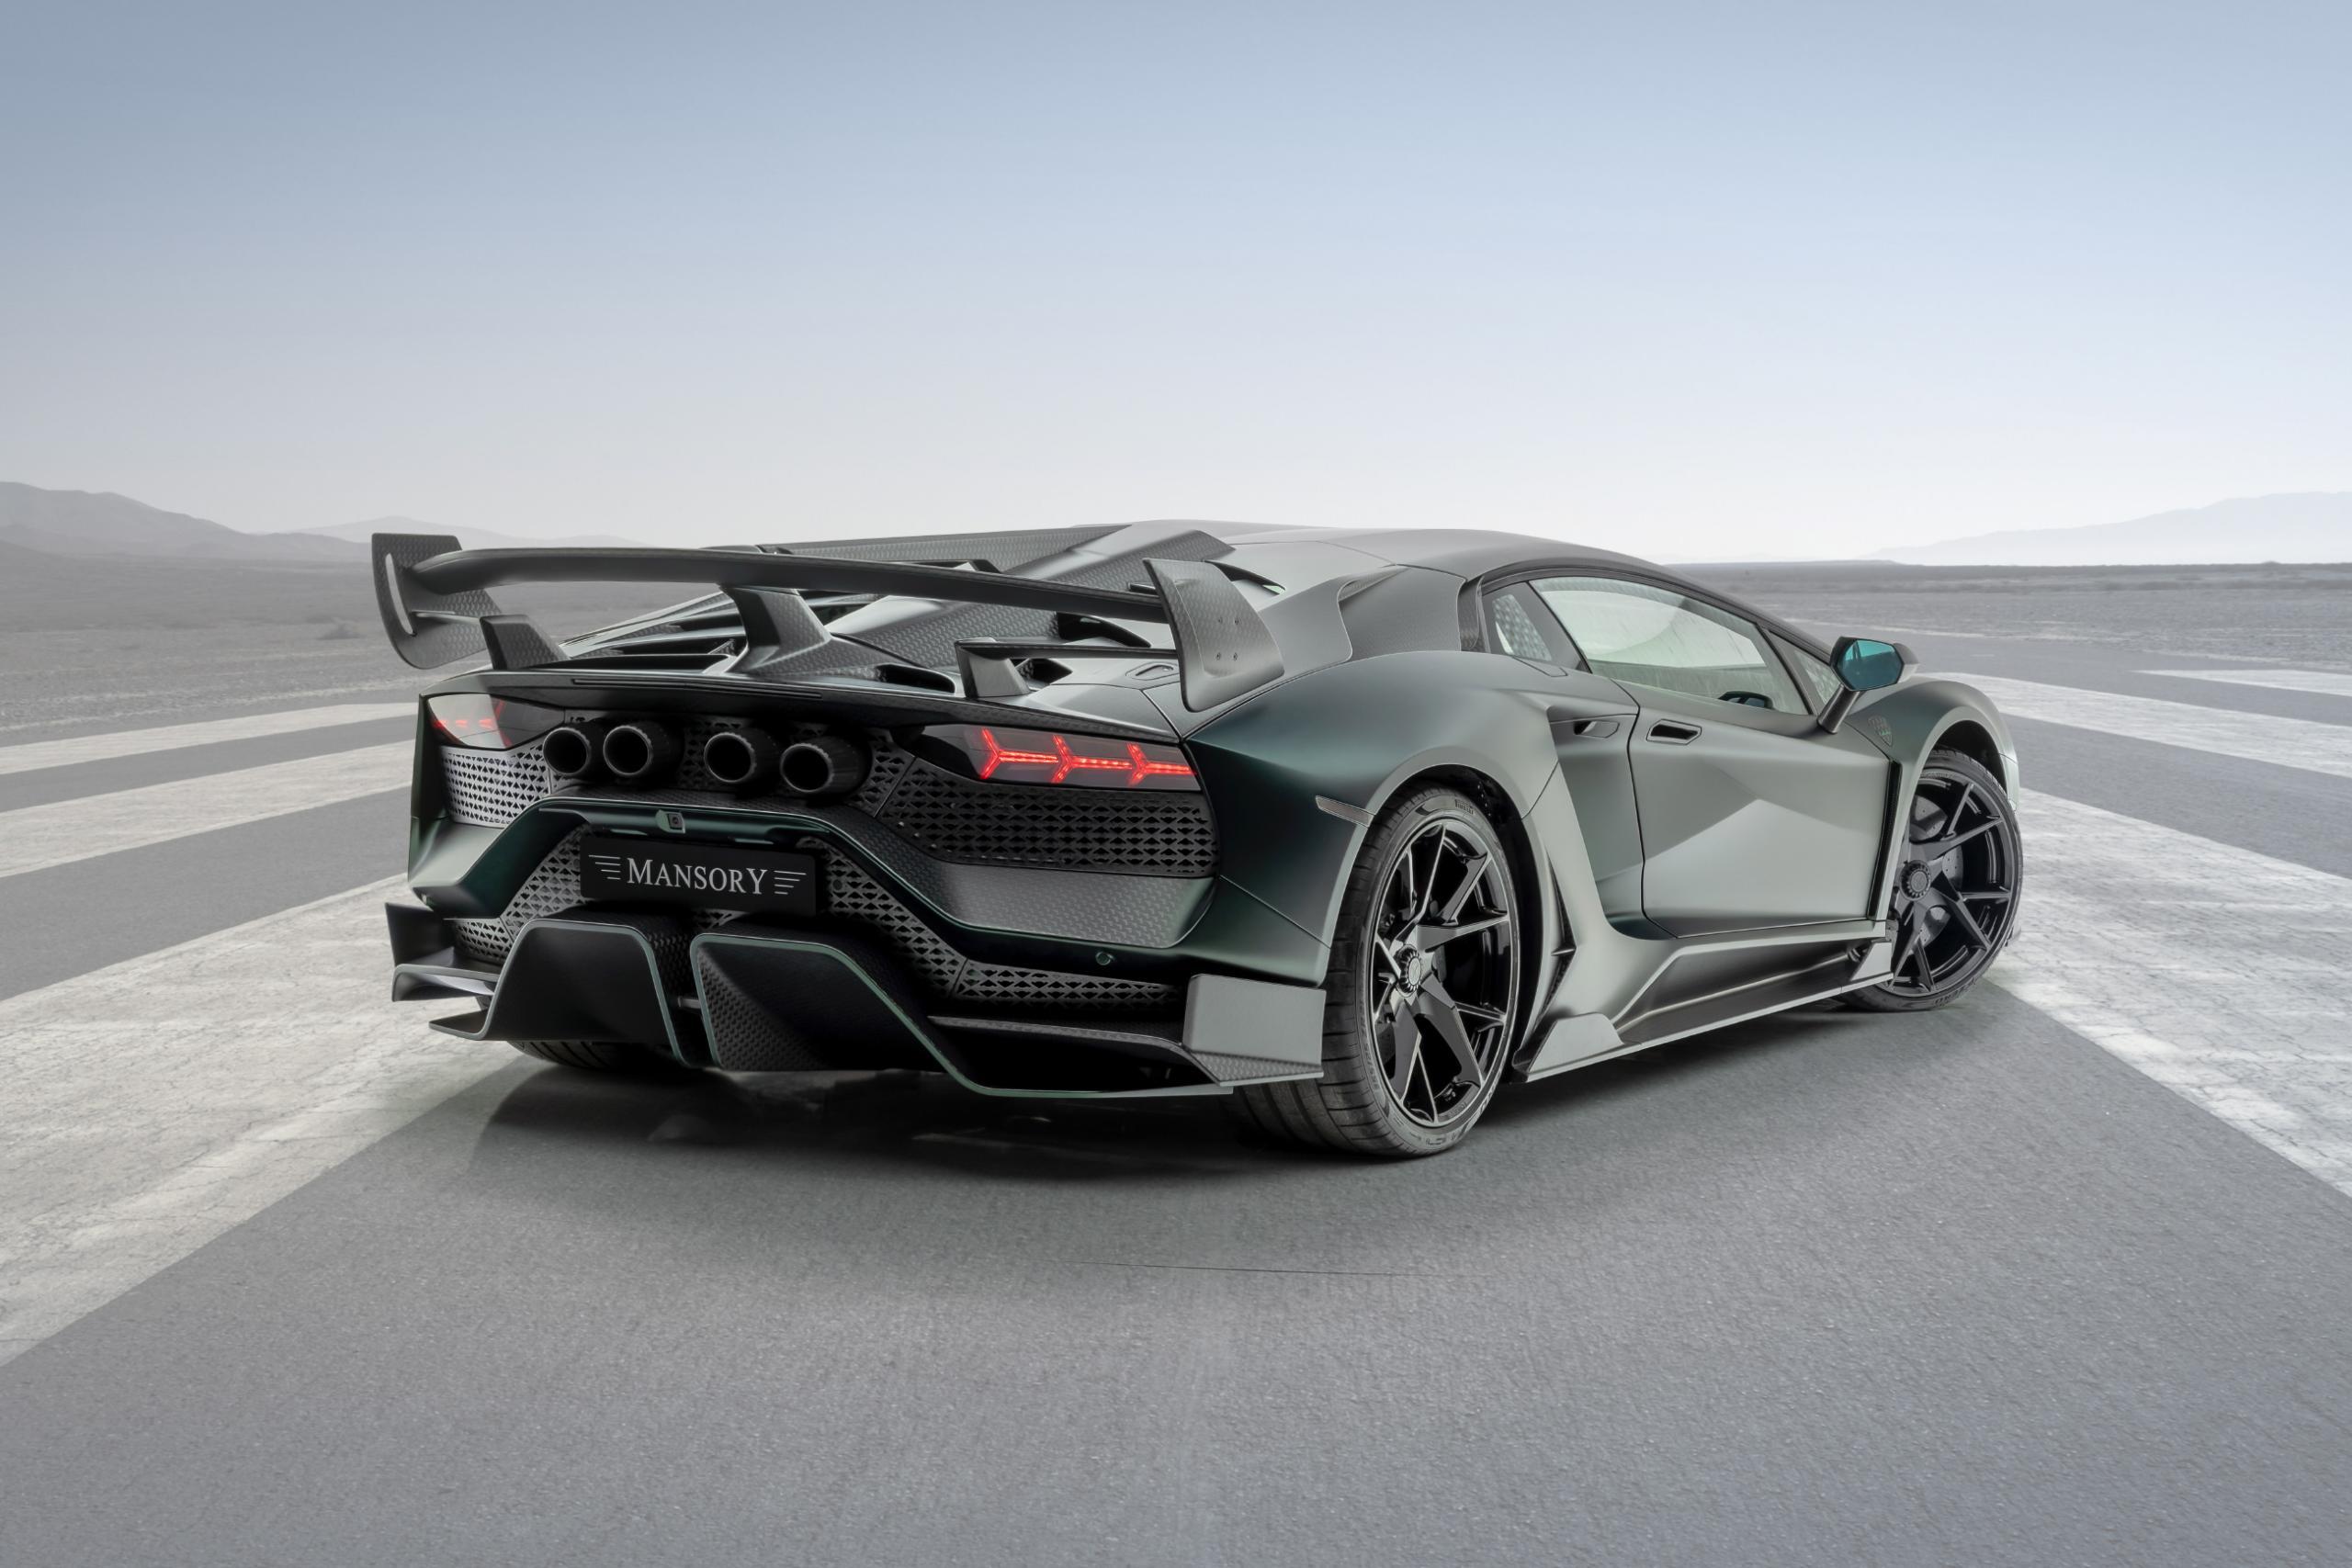 Mansory Lamborghini Aventador SVJ Rear